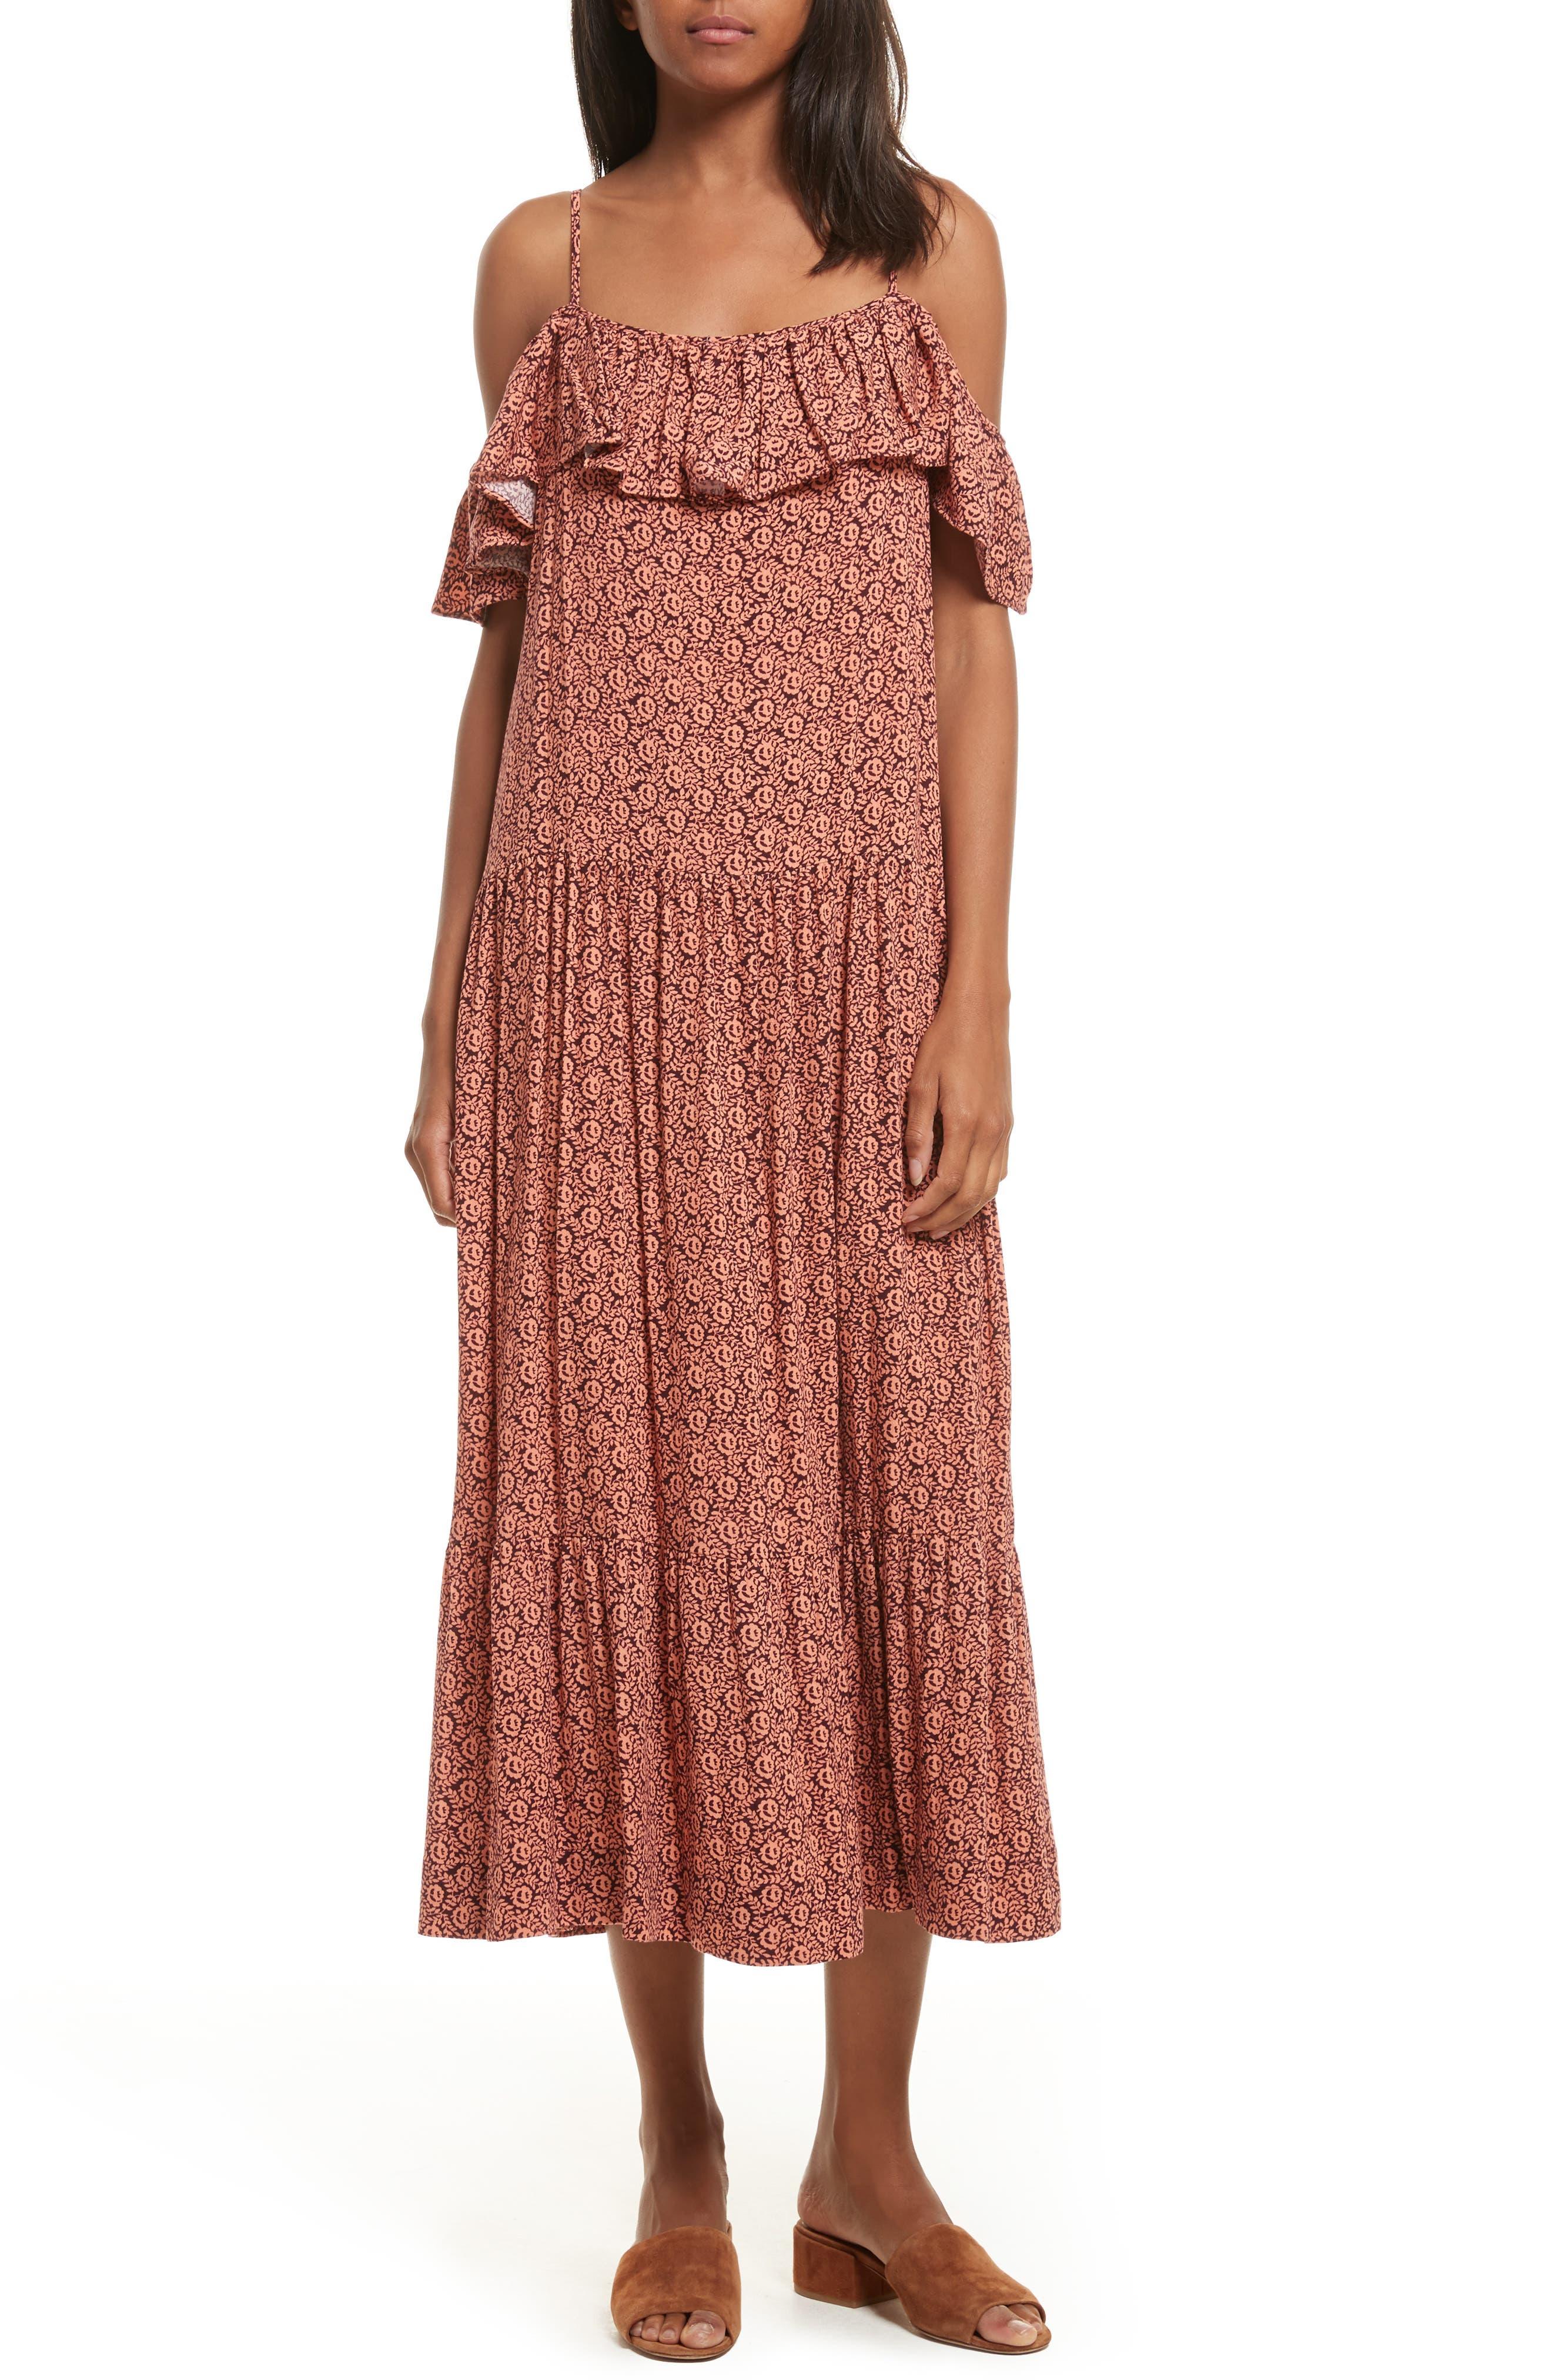 Rebecca Minkoff Lapaz Off the Shoulder Midi Dress